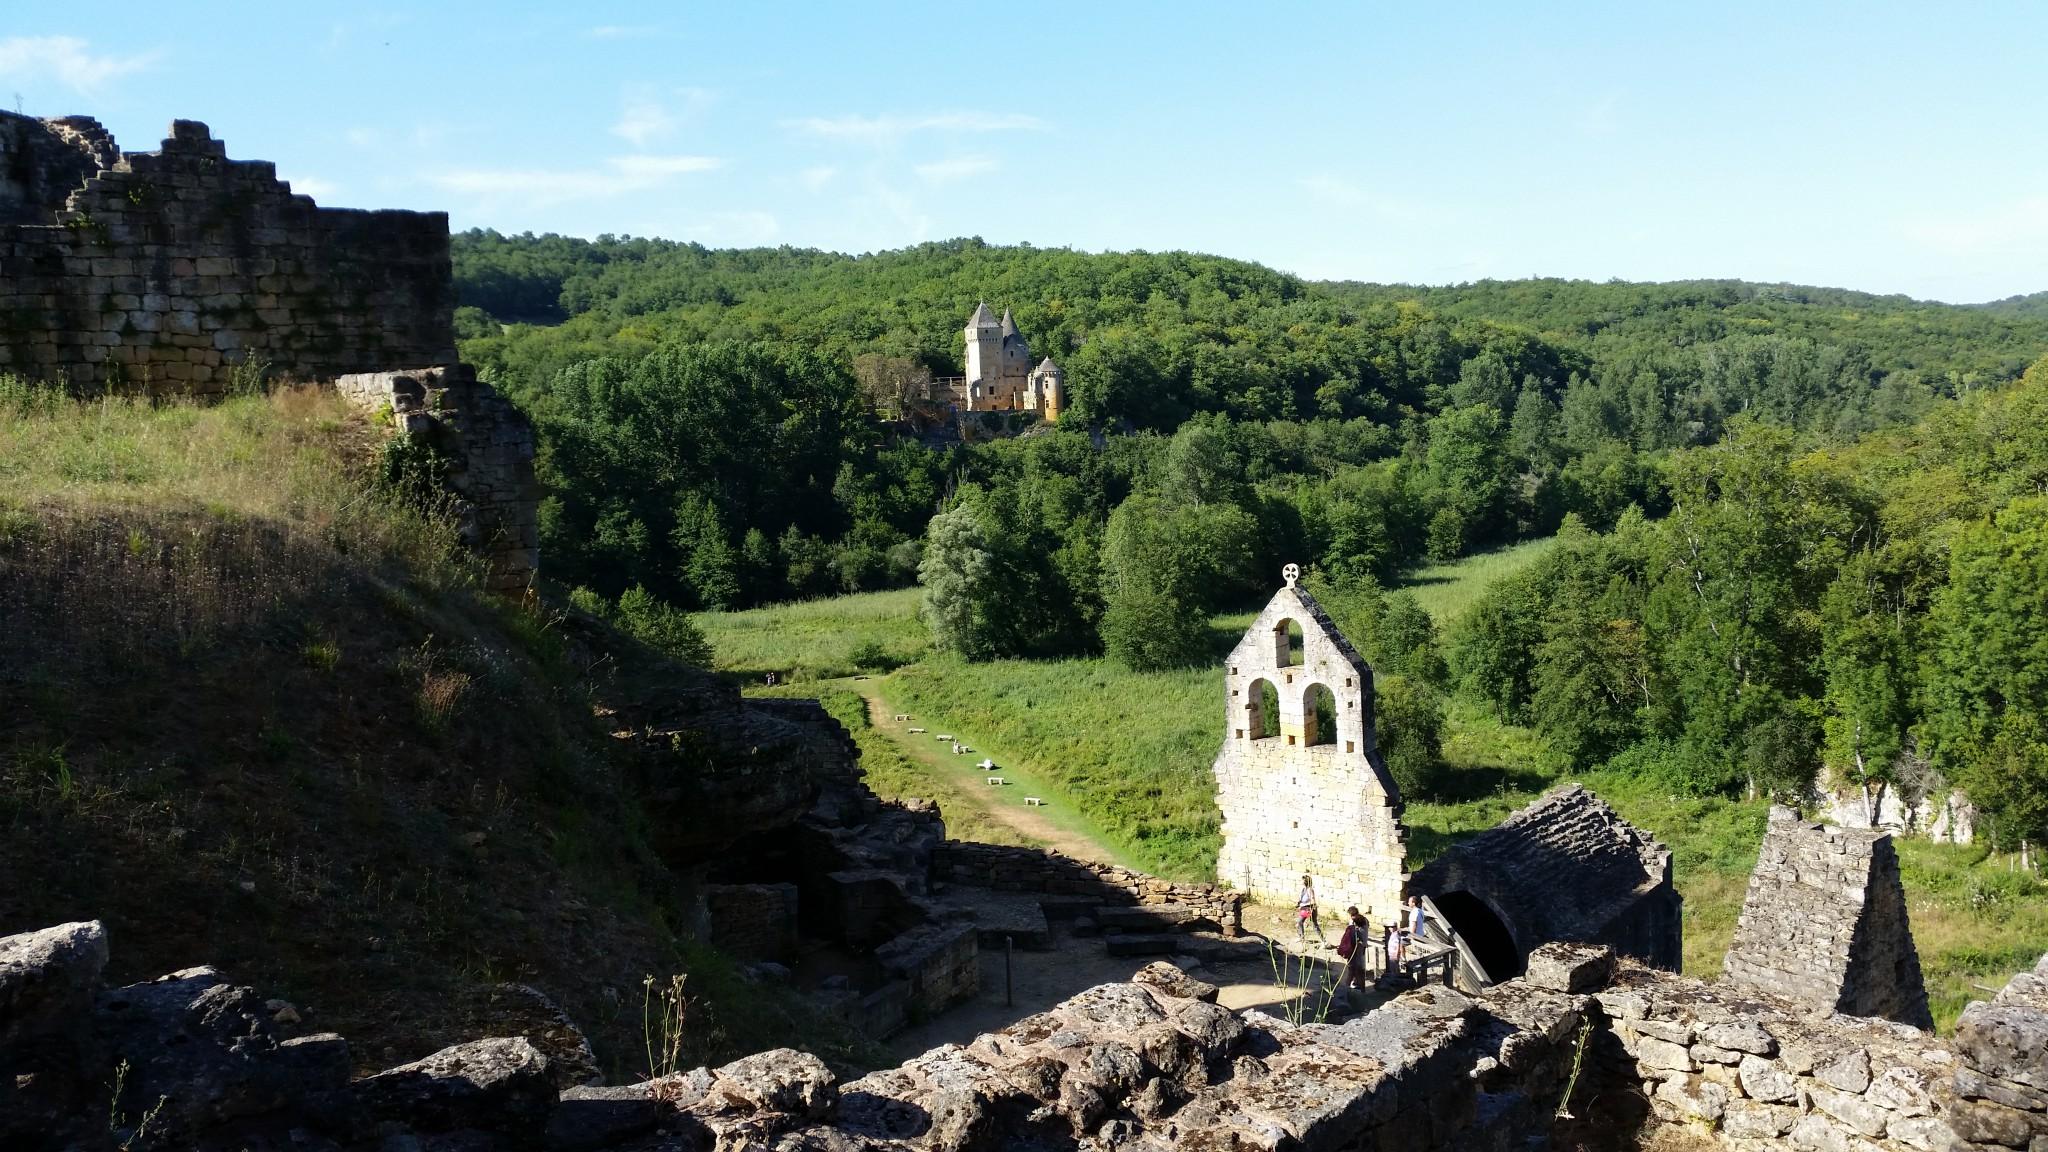 Vuda sus la chapela e Laussel en fons